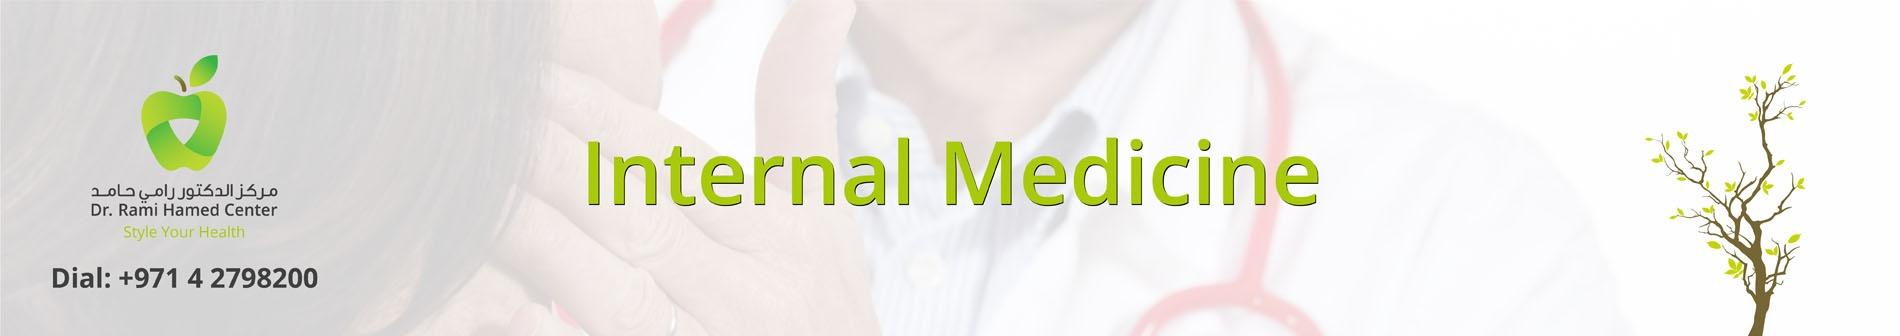 Dubai Internal Medicine Clinic